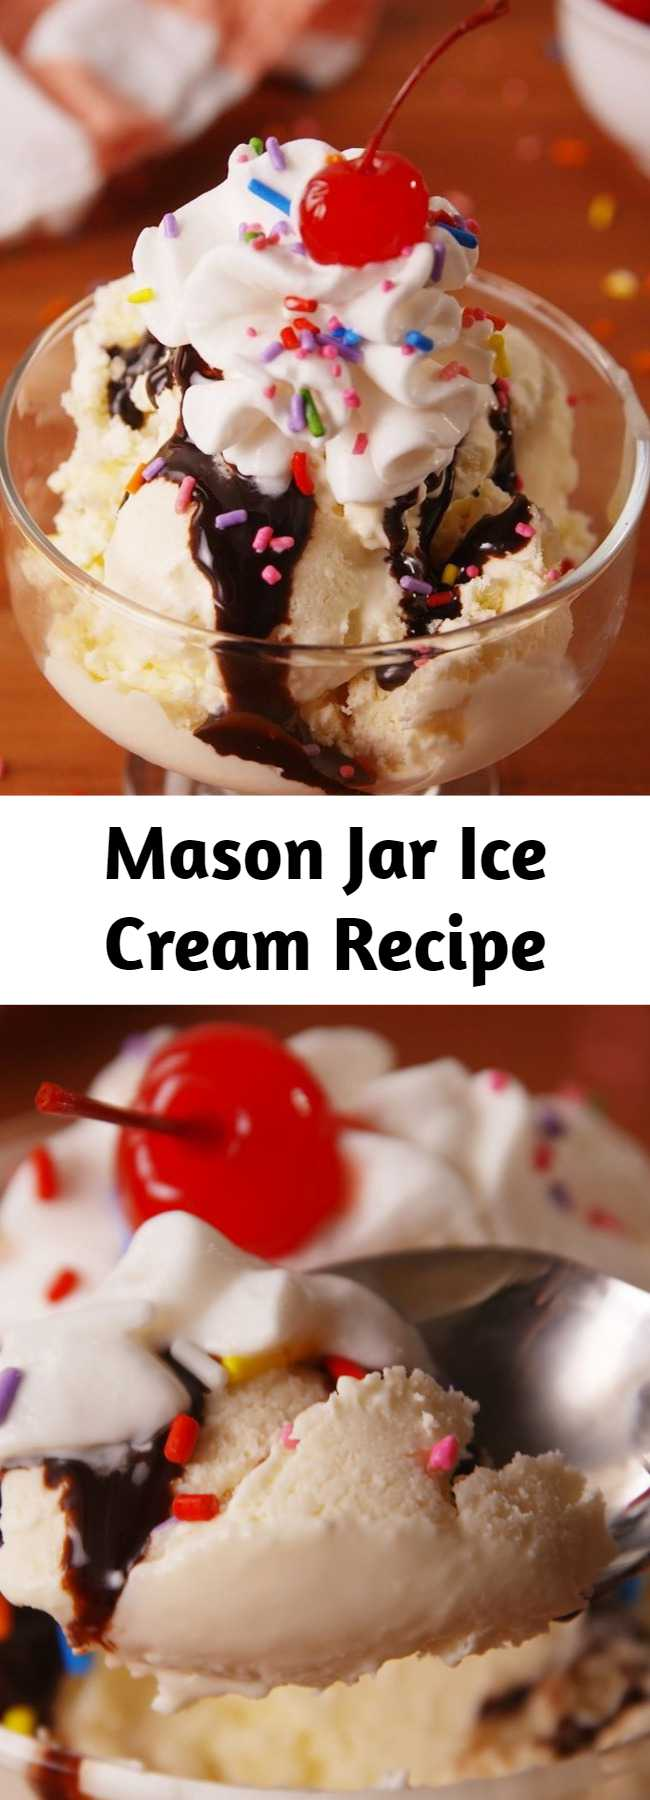 Mason Jar Ice Cream Recipe - Easy to make homemade ice cream with just 4 ingredients. No need to scream for ice cream!